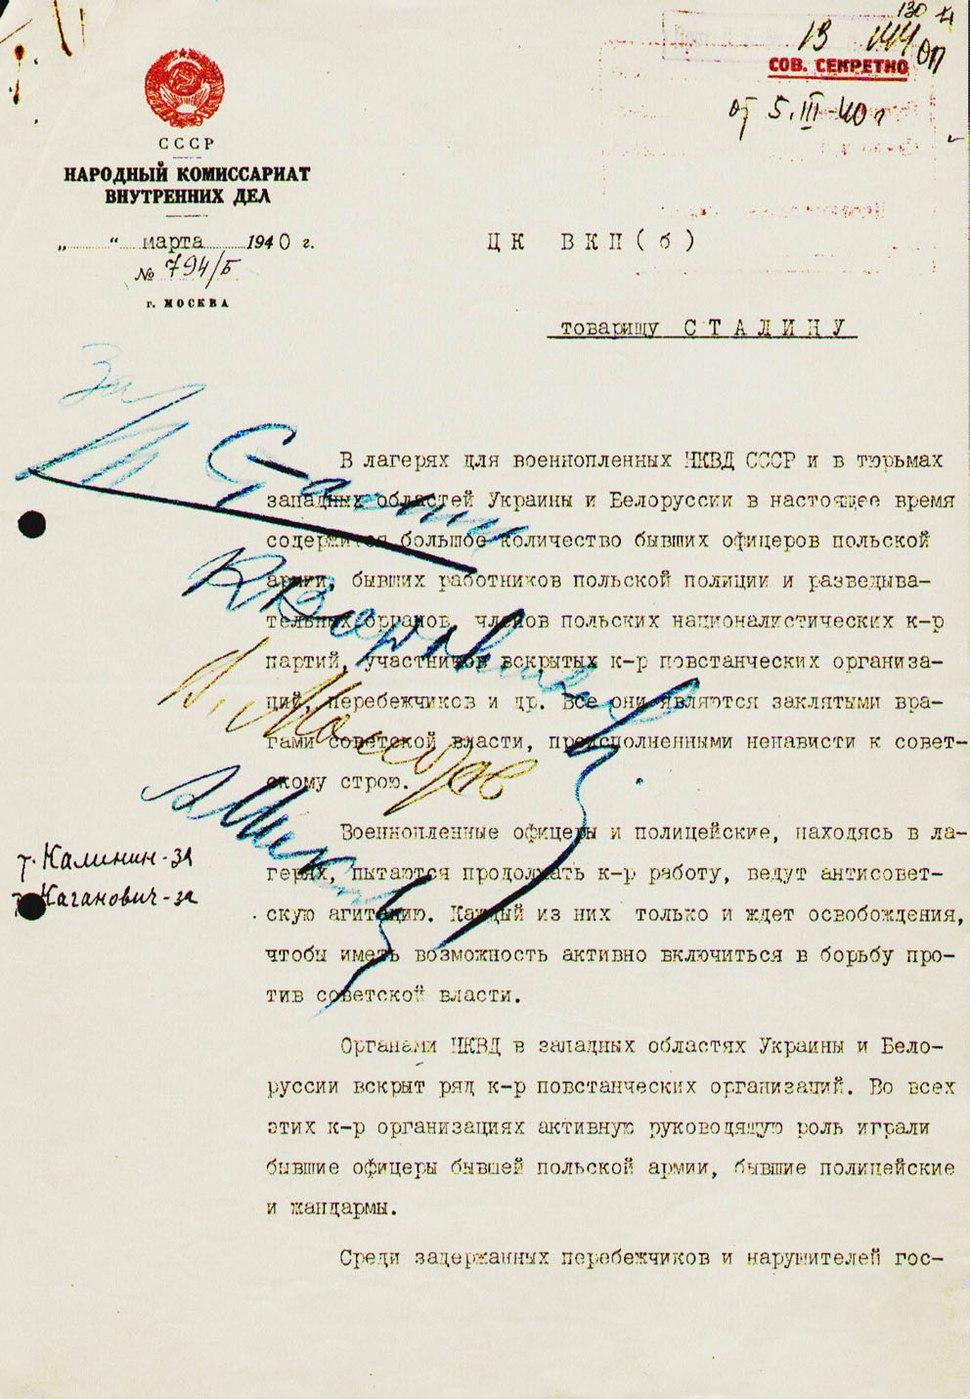 Katyn - decision of massacre p1